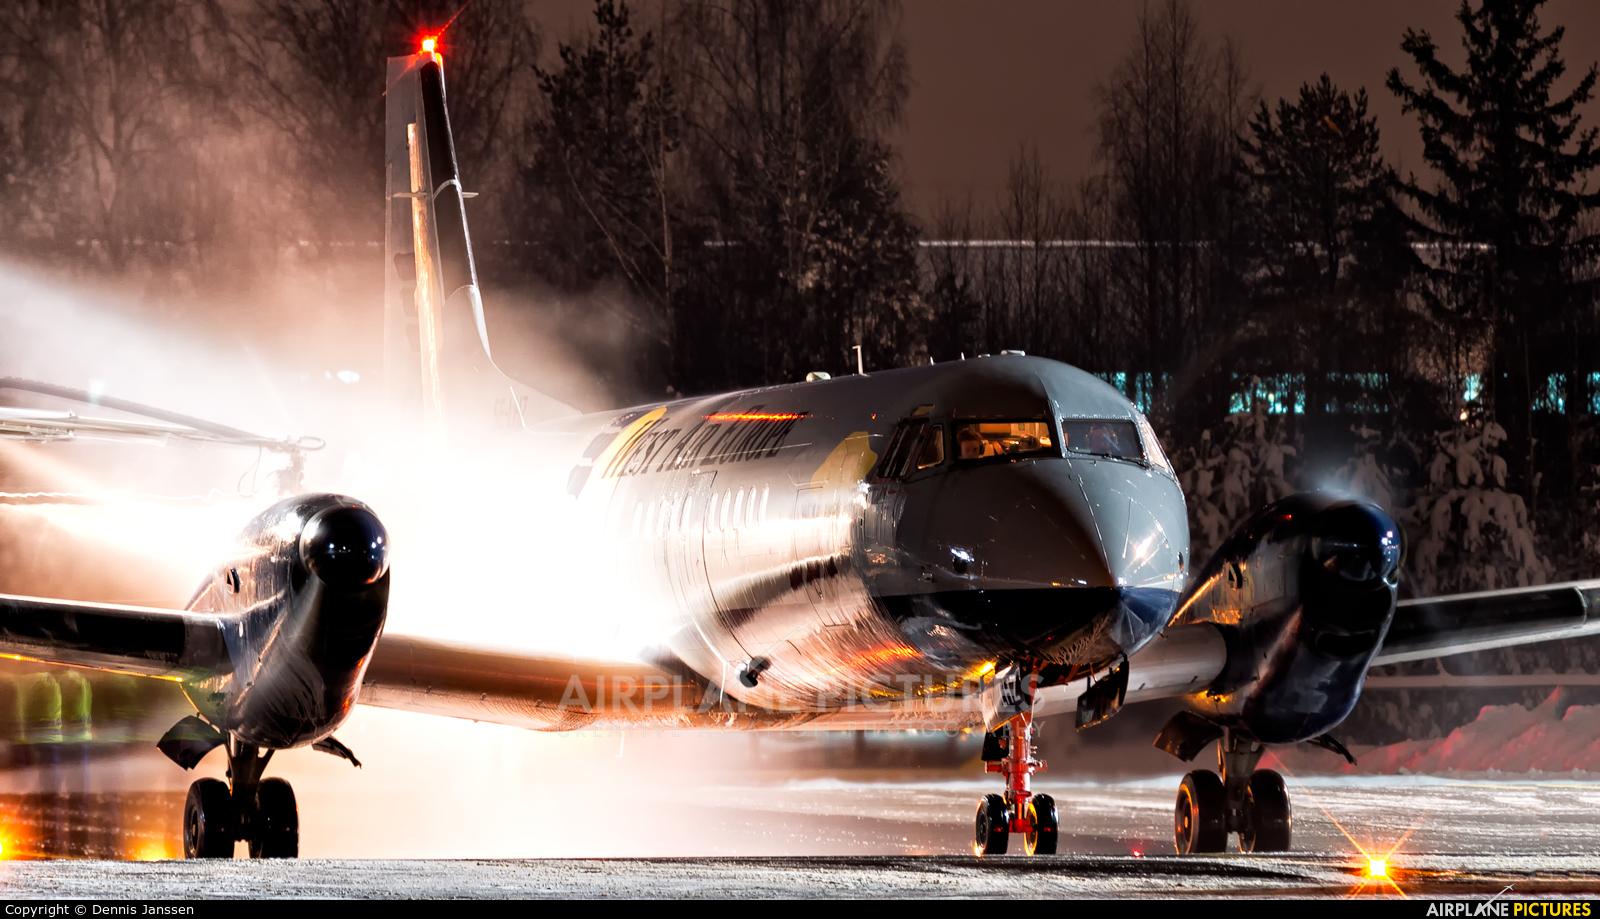 West Air Europe SE-LHZ aircraft at Oslo - Gardermoen